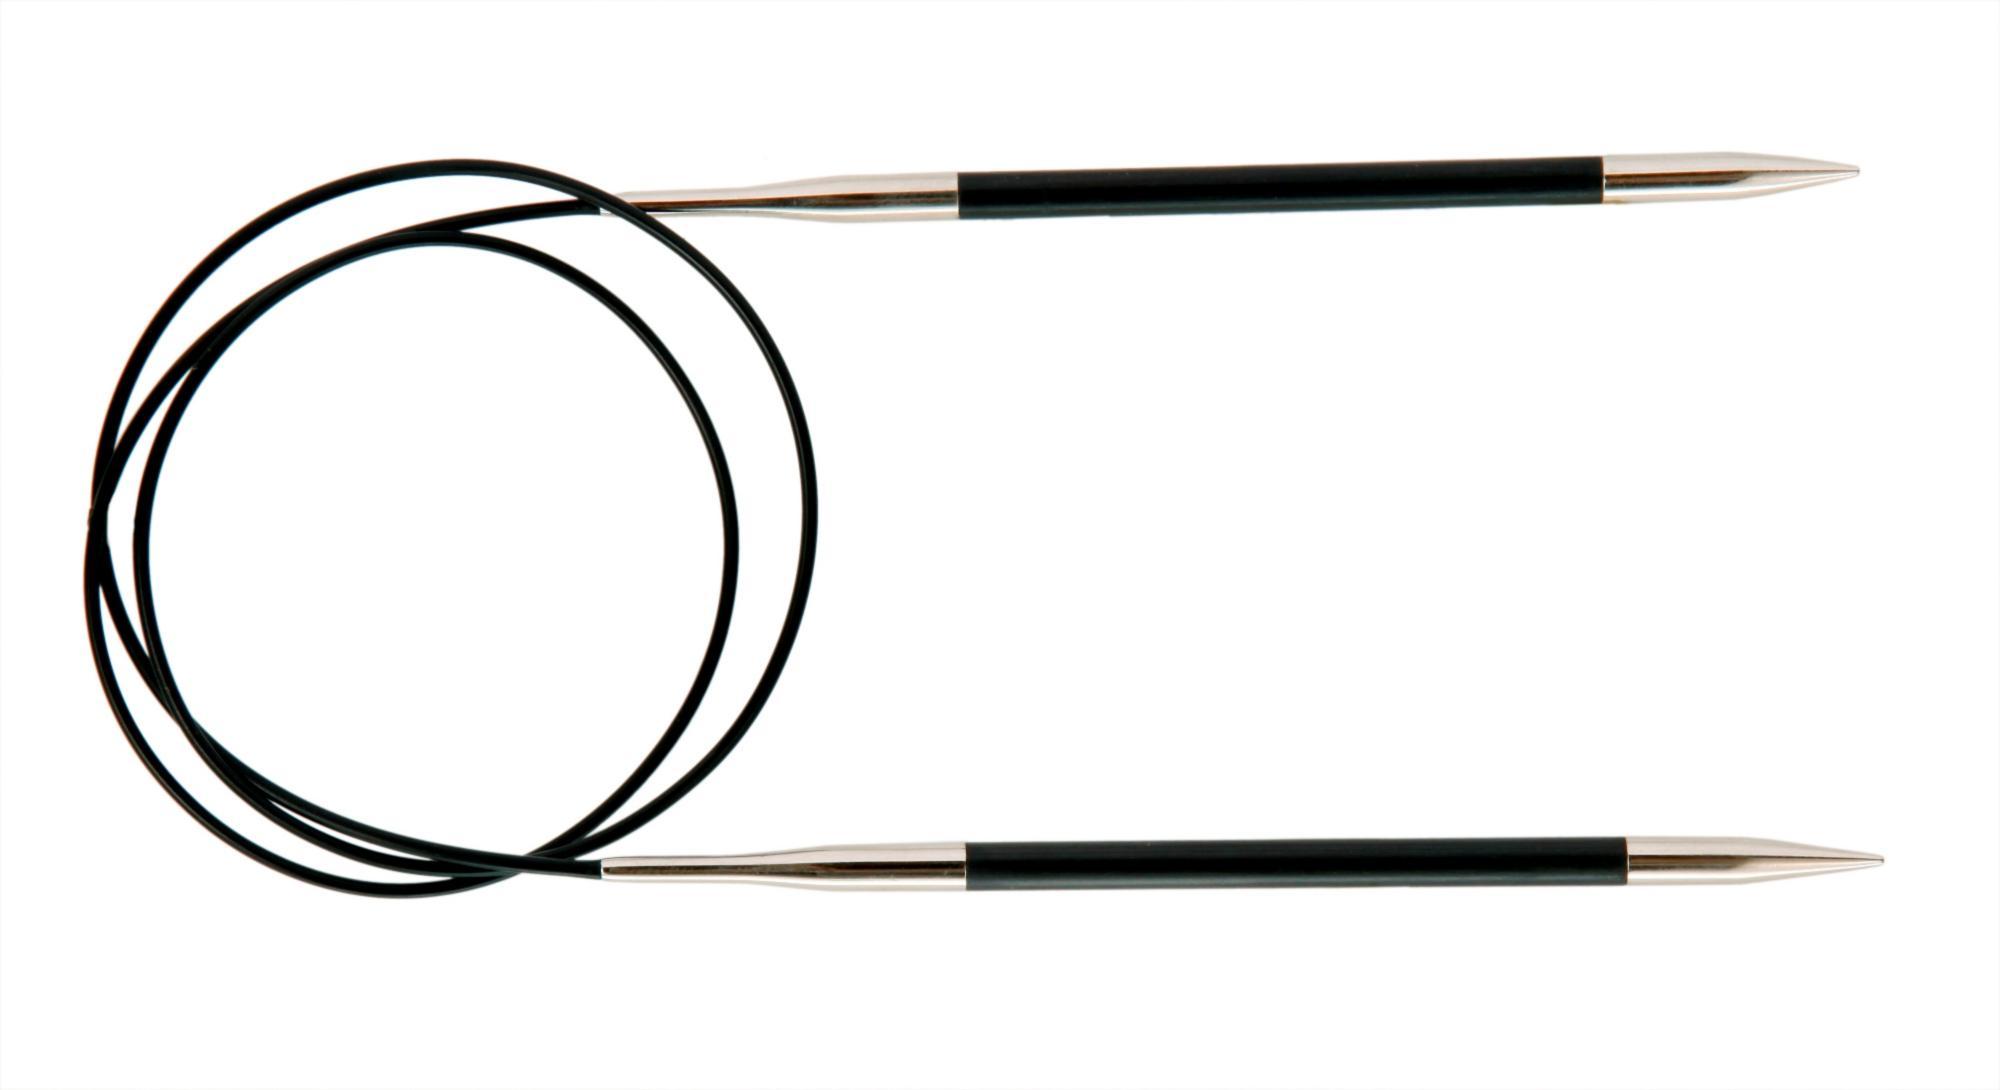 Спицы круговые 100 см Karbonz KnitPro, 41208, 3.75 мм